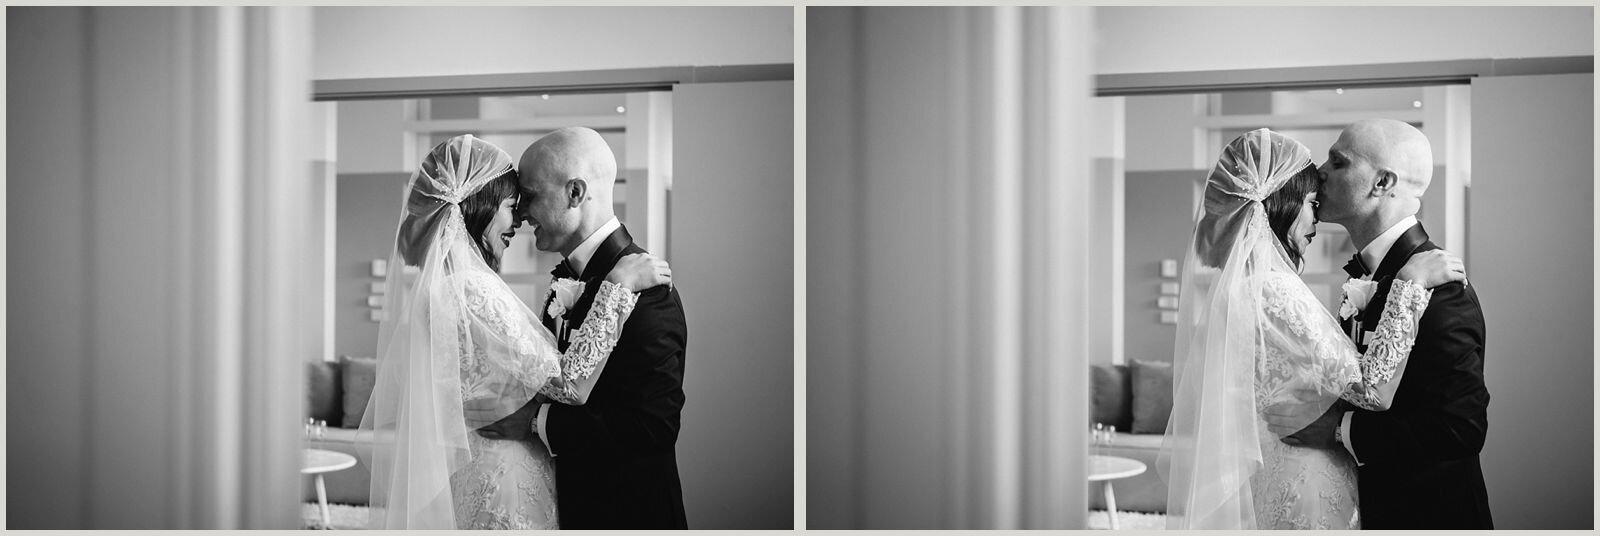 joseph_koprek_wedding_melbourne_the_prince_deck_0021.jpg